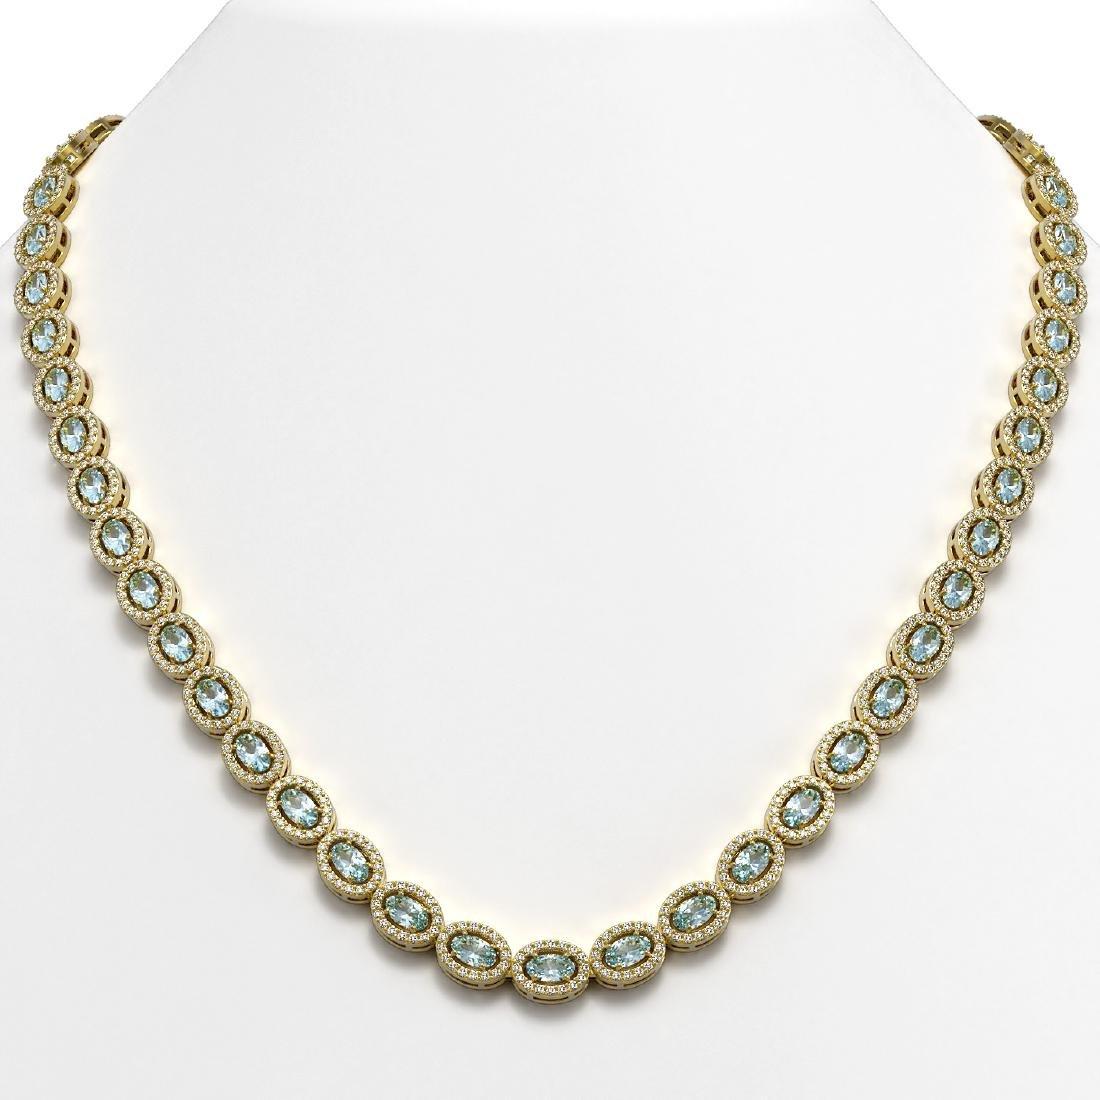 20.71 CTW Aquamarine & Diamond Halo Necklace 10K Yellow